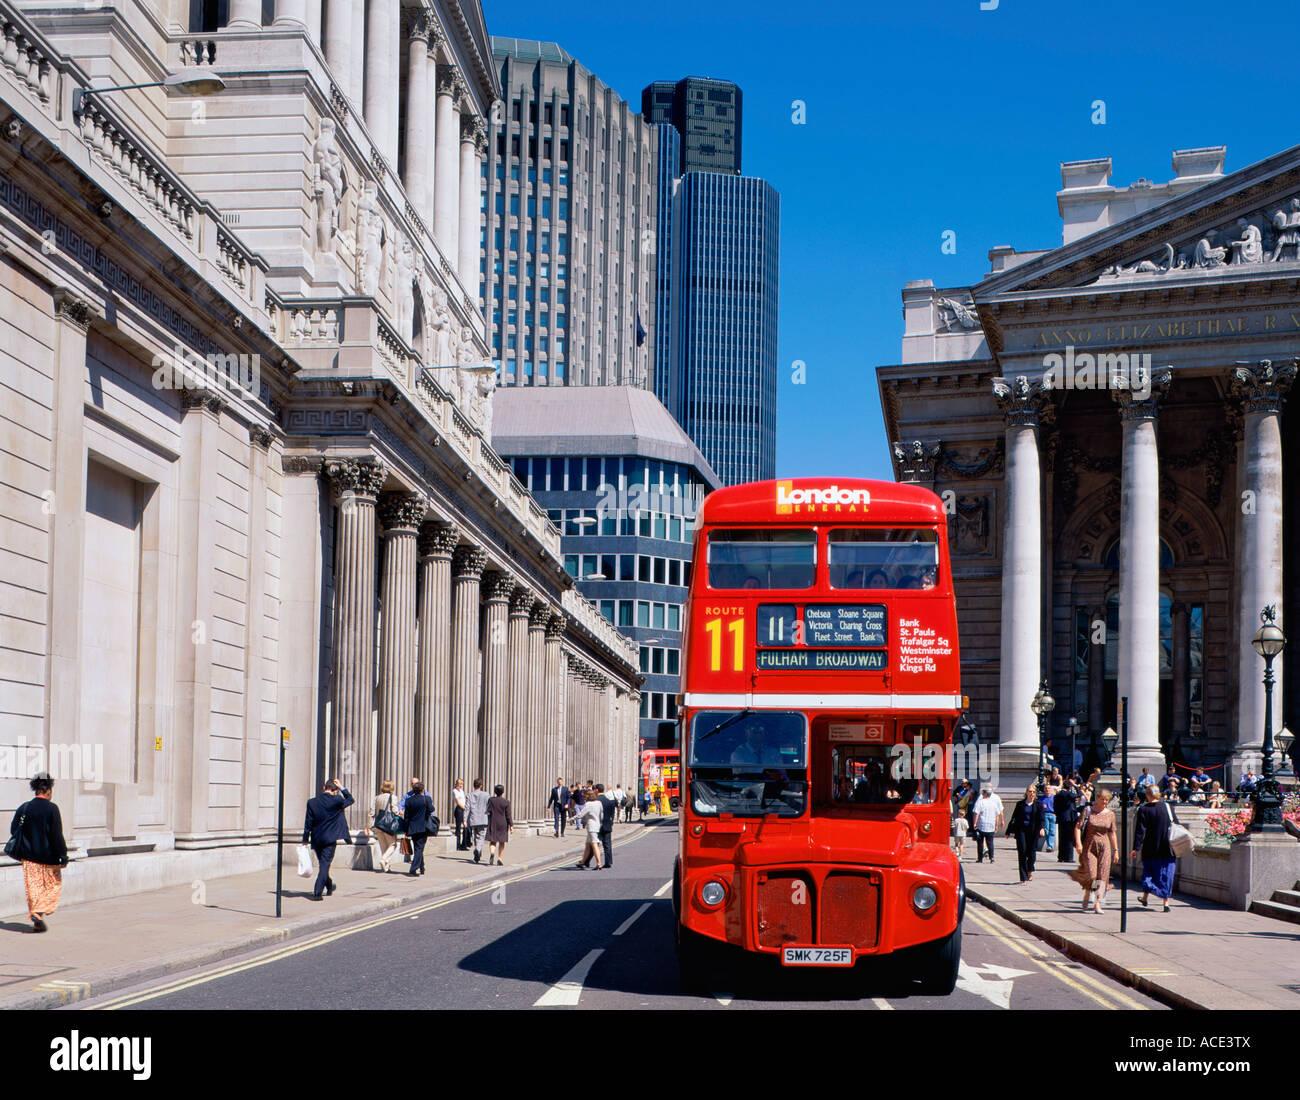 GB LONDON CITY THREADNEEDLE STREET BANK OF ENGLAND - Stock Image